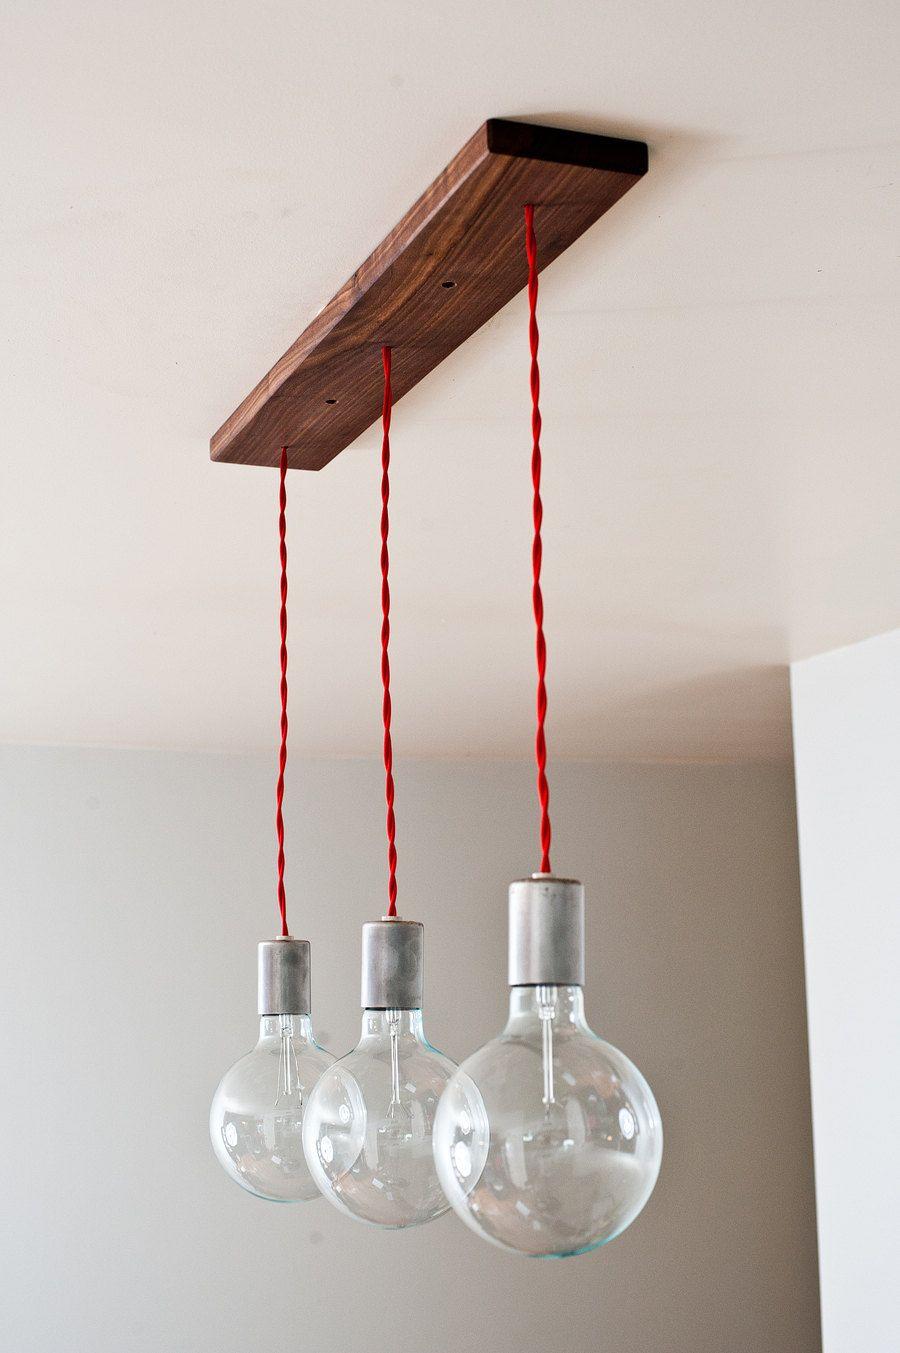 Plafondlamp 85441: modern, aluminium, wit, glans, rond ...